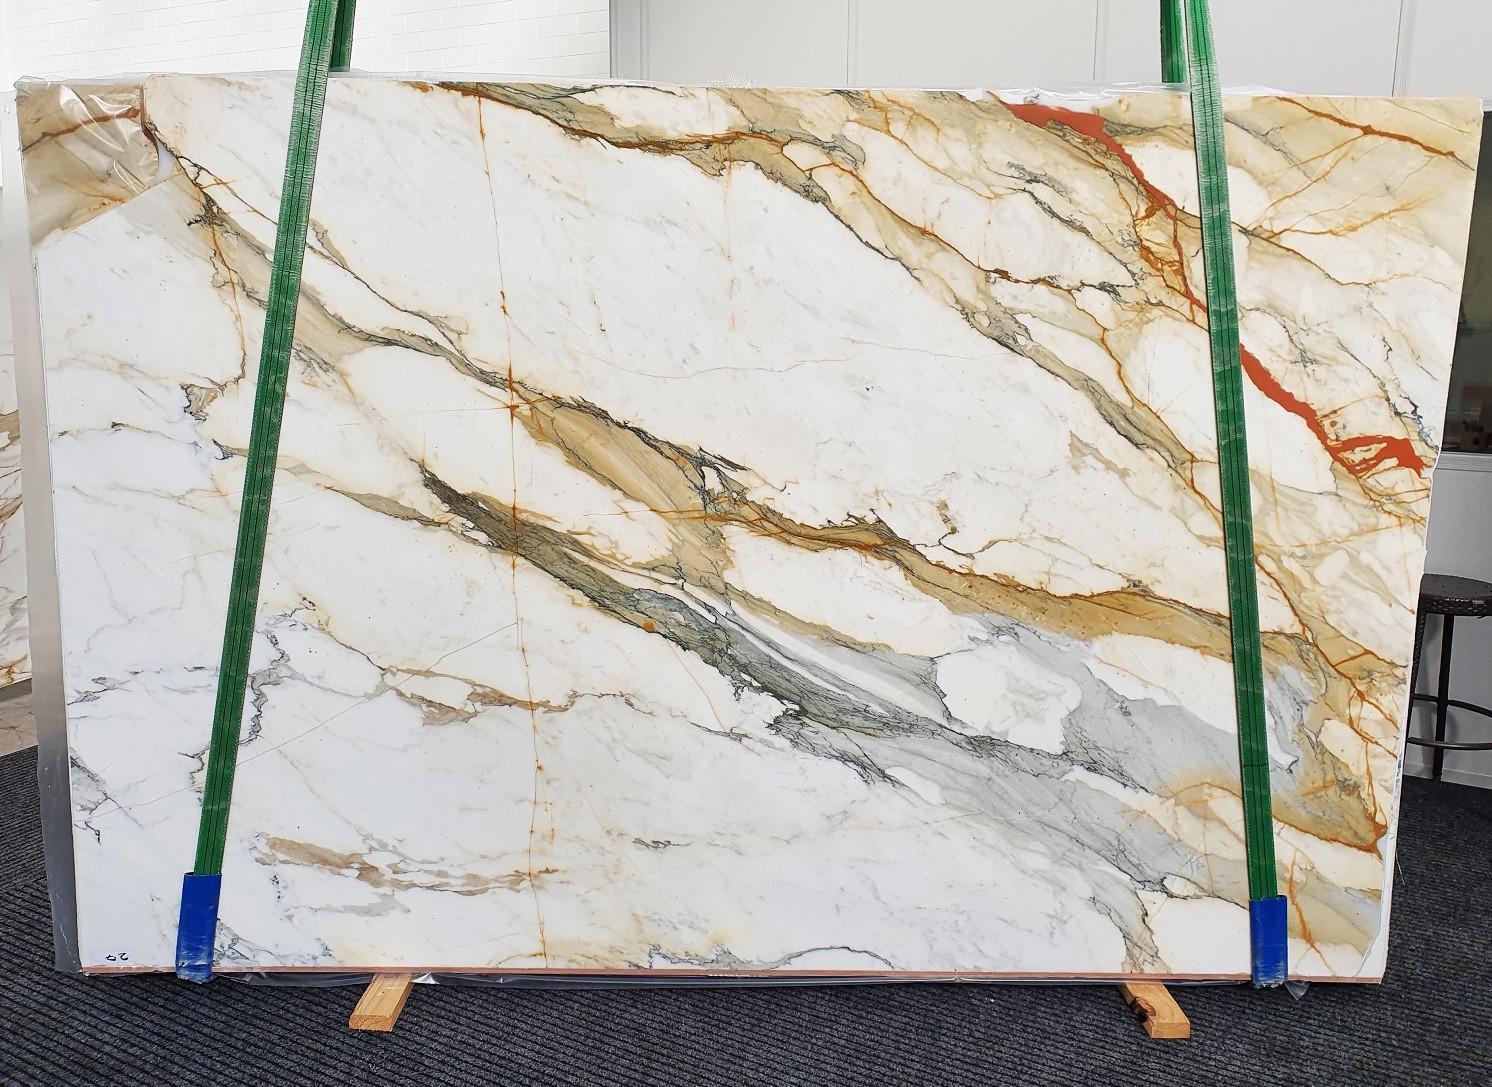 CALACATTA MACCHIAVECCHIA Suministro Veneto (Italia) de planchas pulidas en mármol natural 1422 , Slab #27